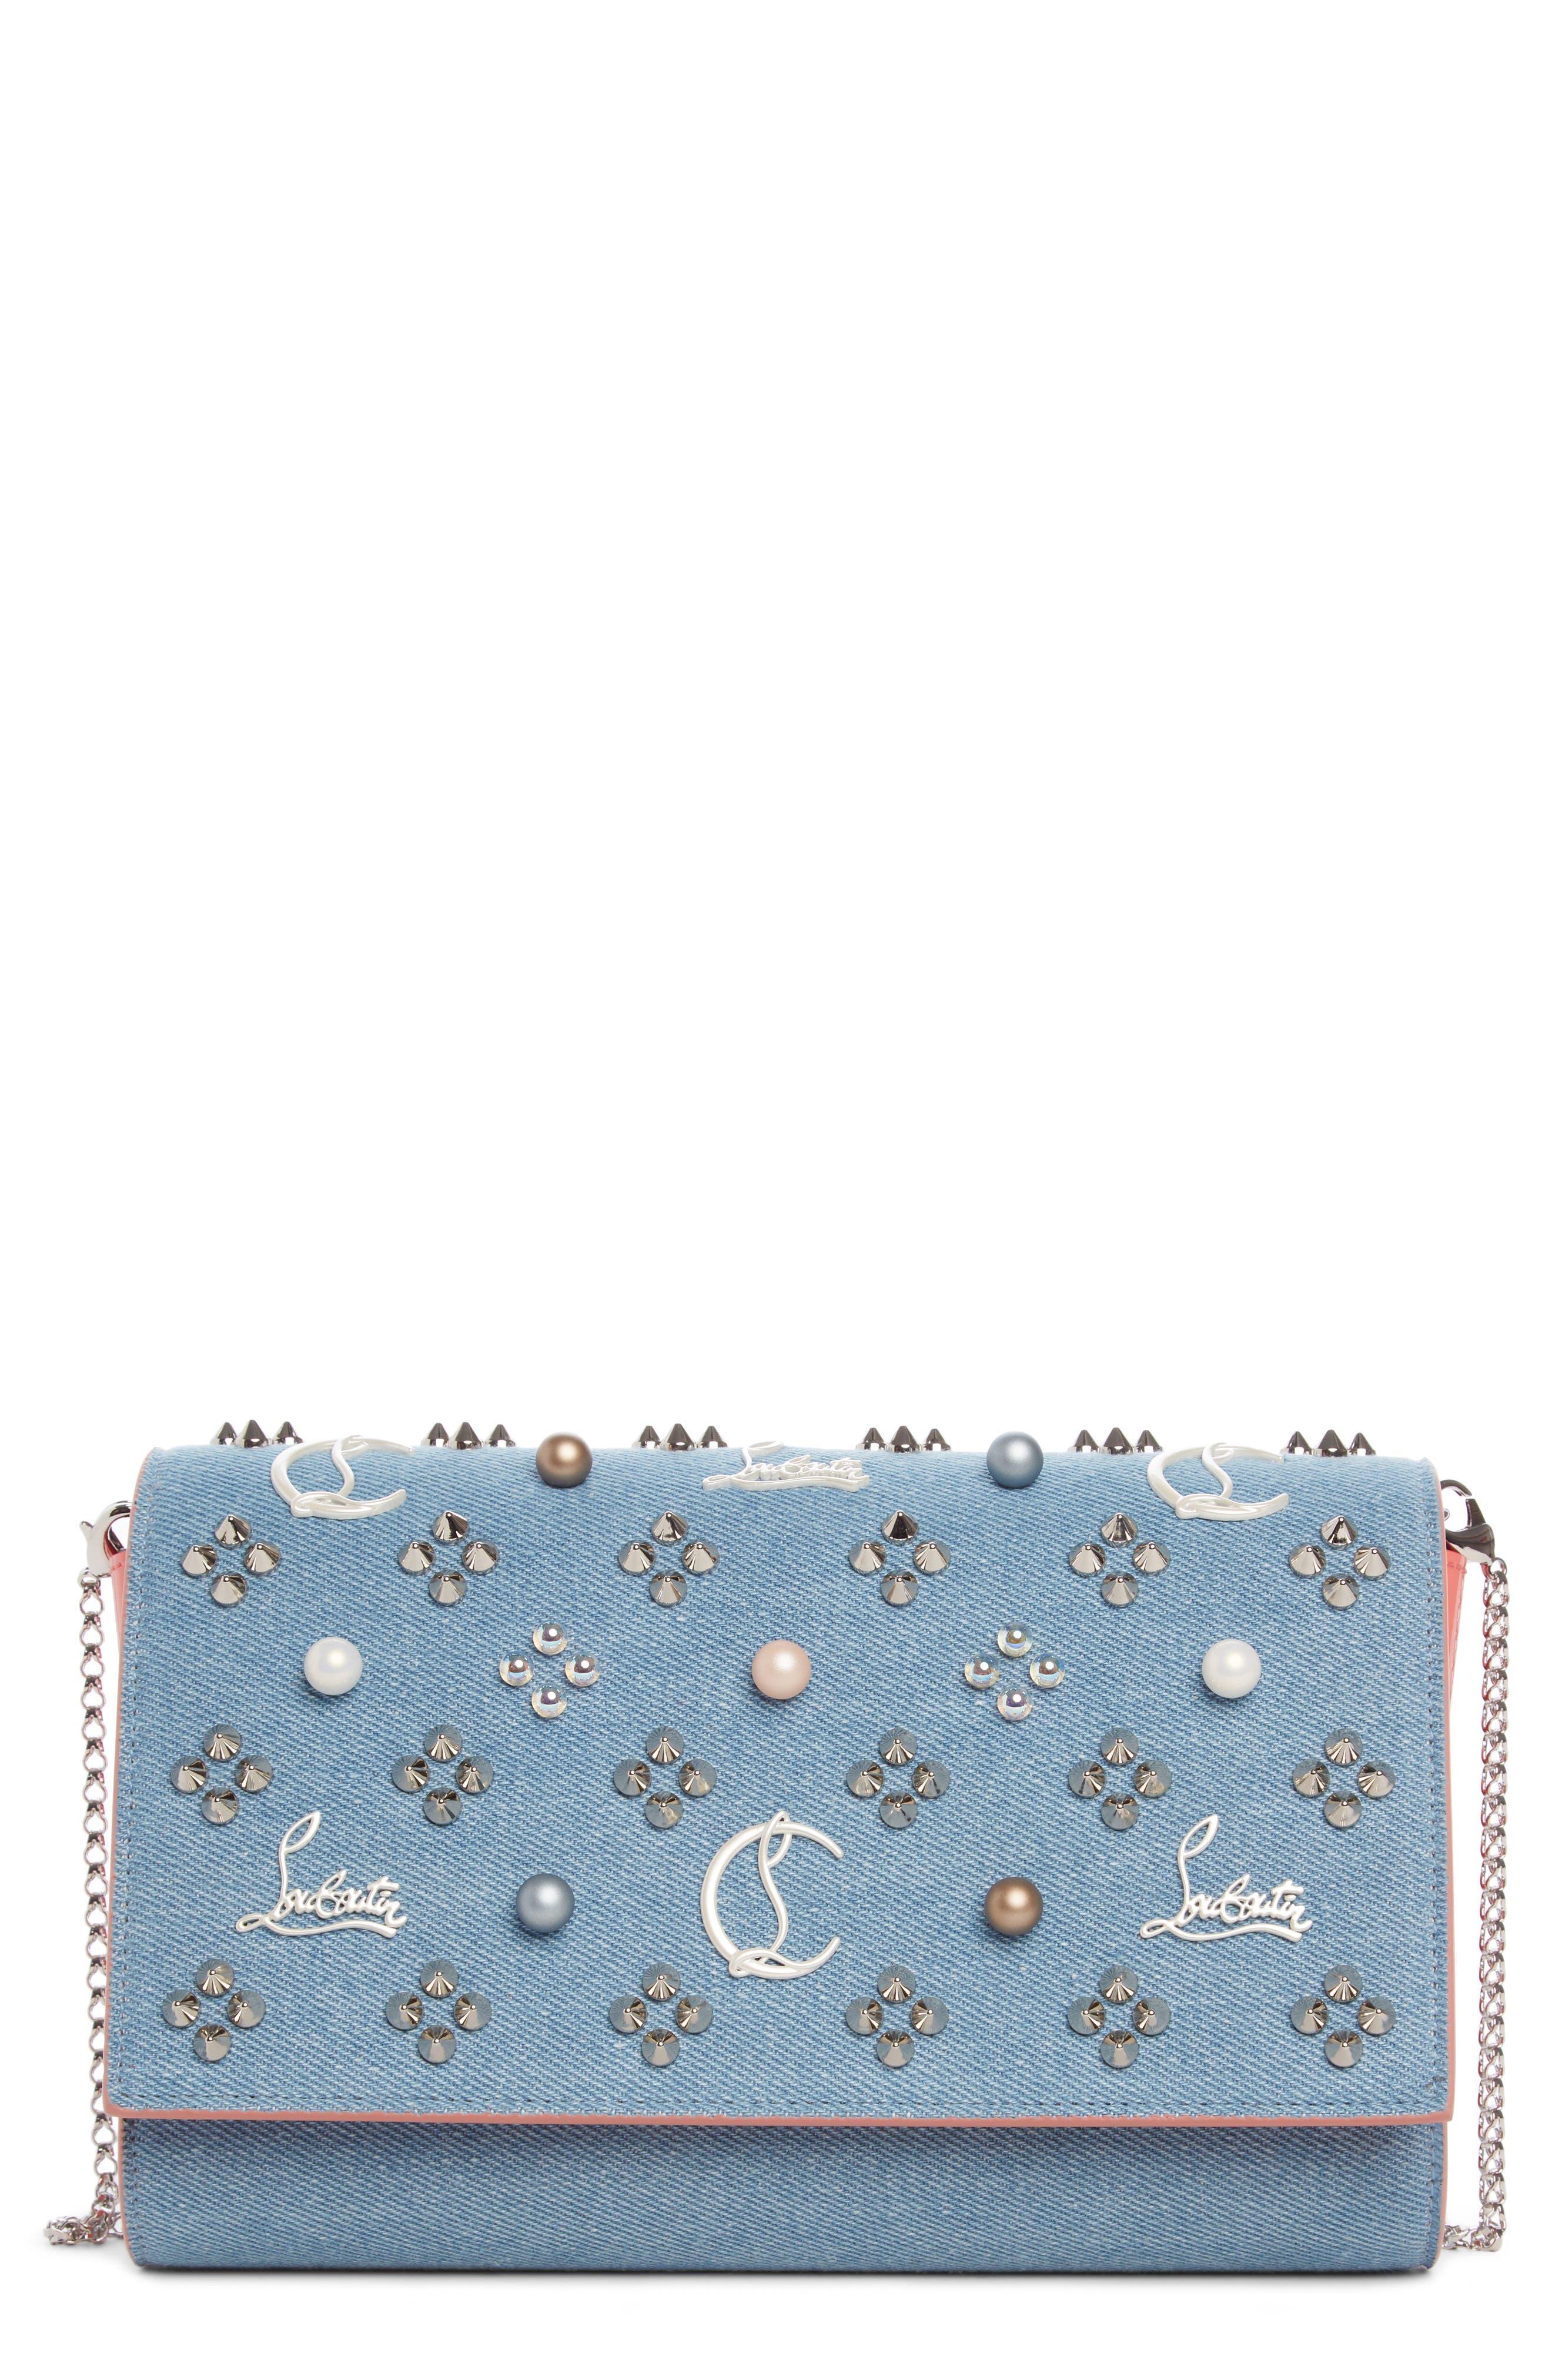 Paloma Studded Denim Clutch,                         Main,                         color, BLUE/ PEARL MIX